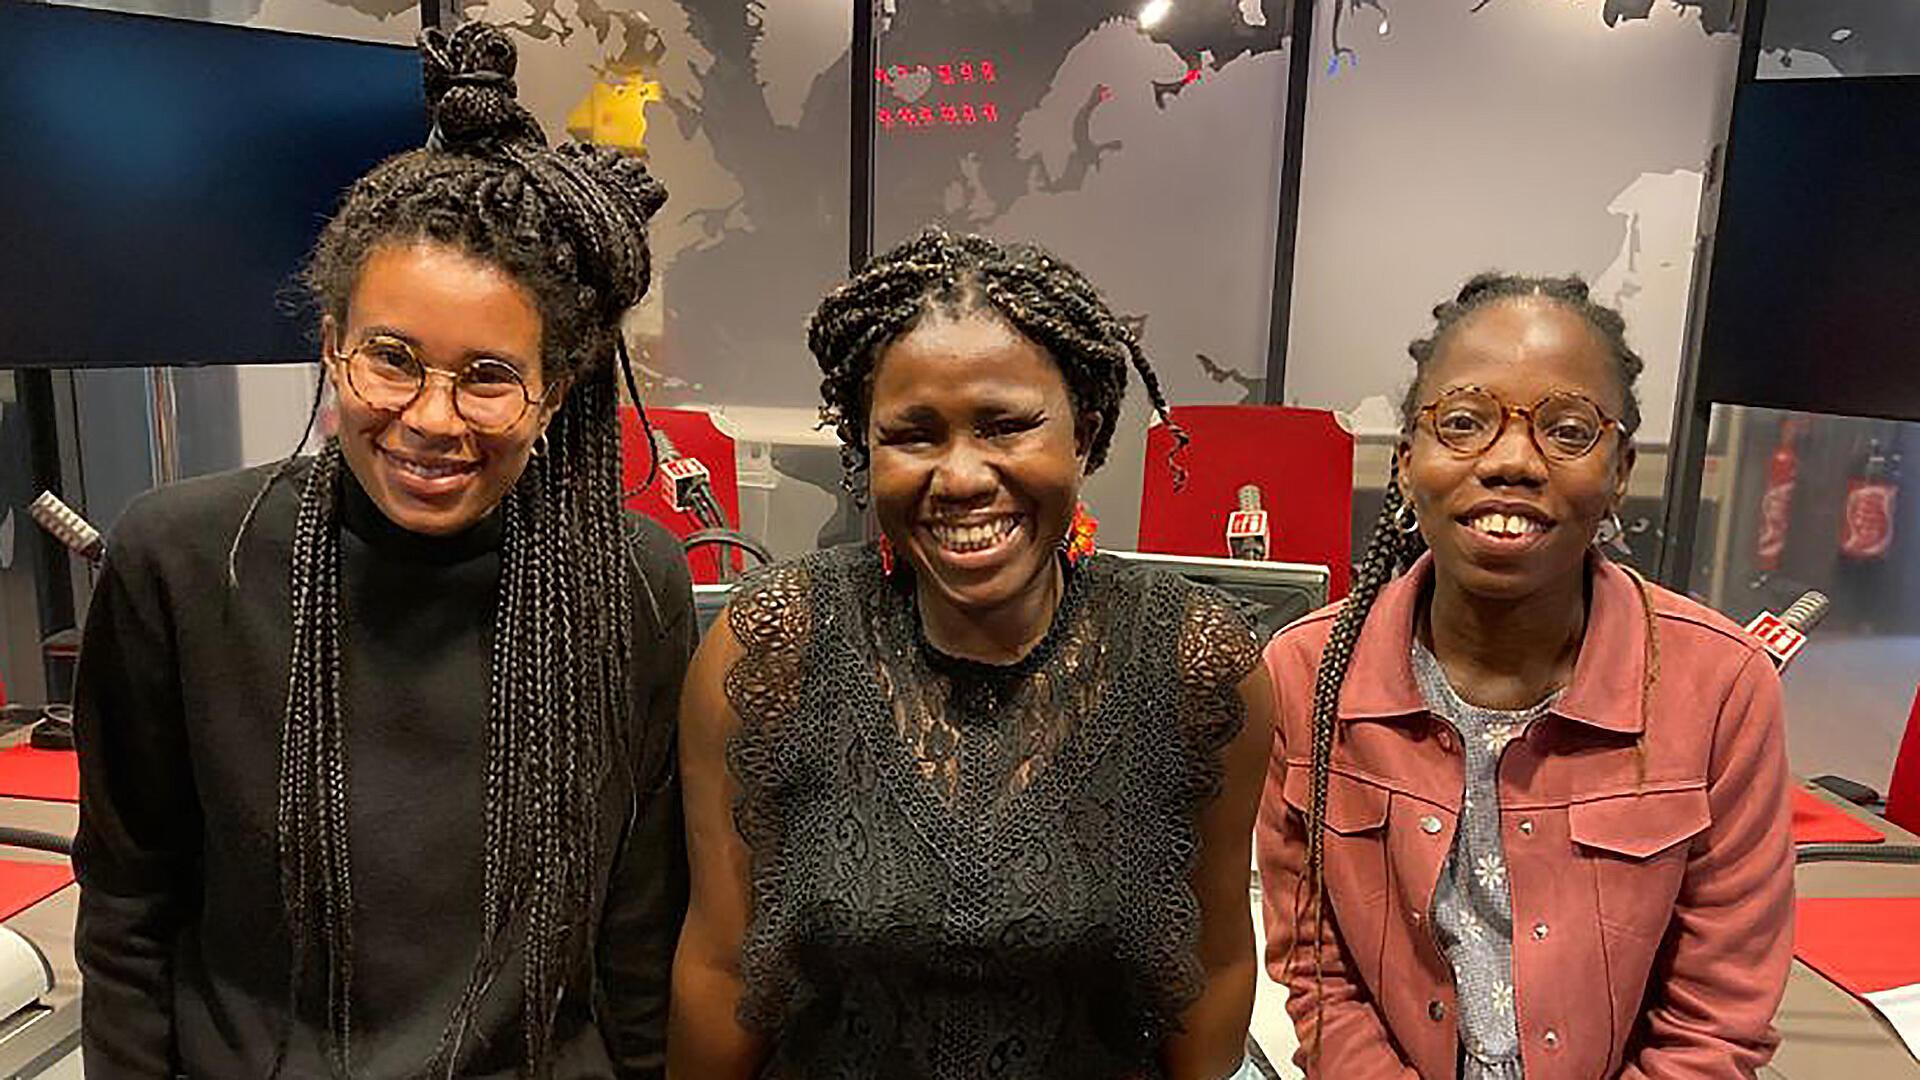 Alors on dit quoi - Marie Yemta Moussanag, Kpénahi Traoré et Sinatou Saka